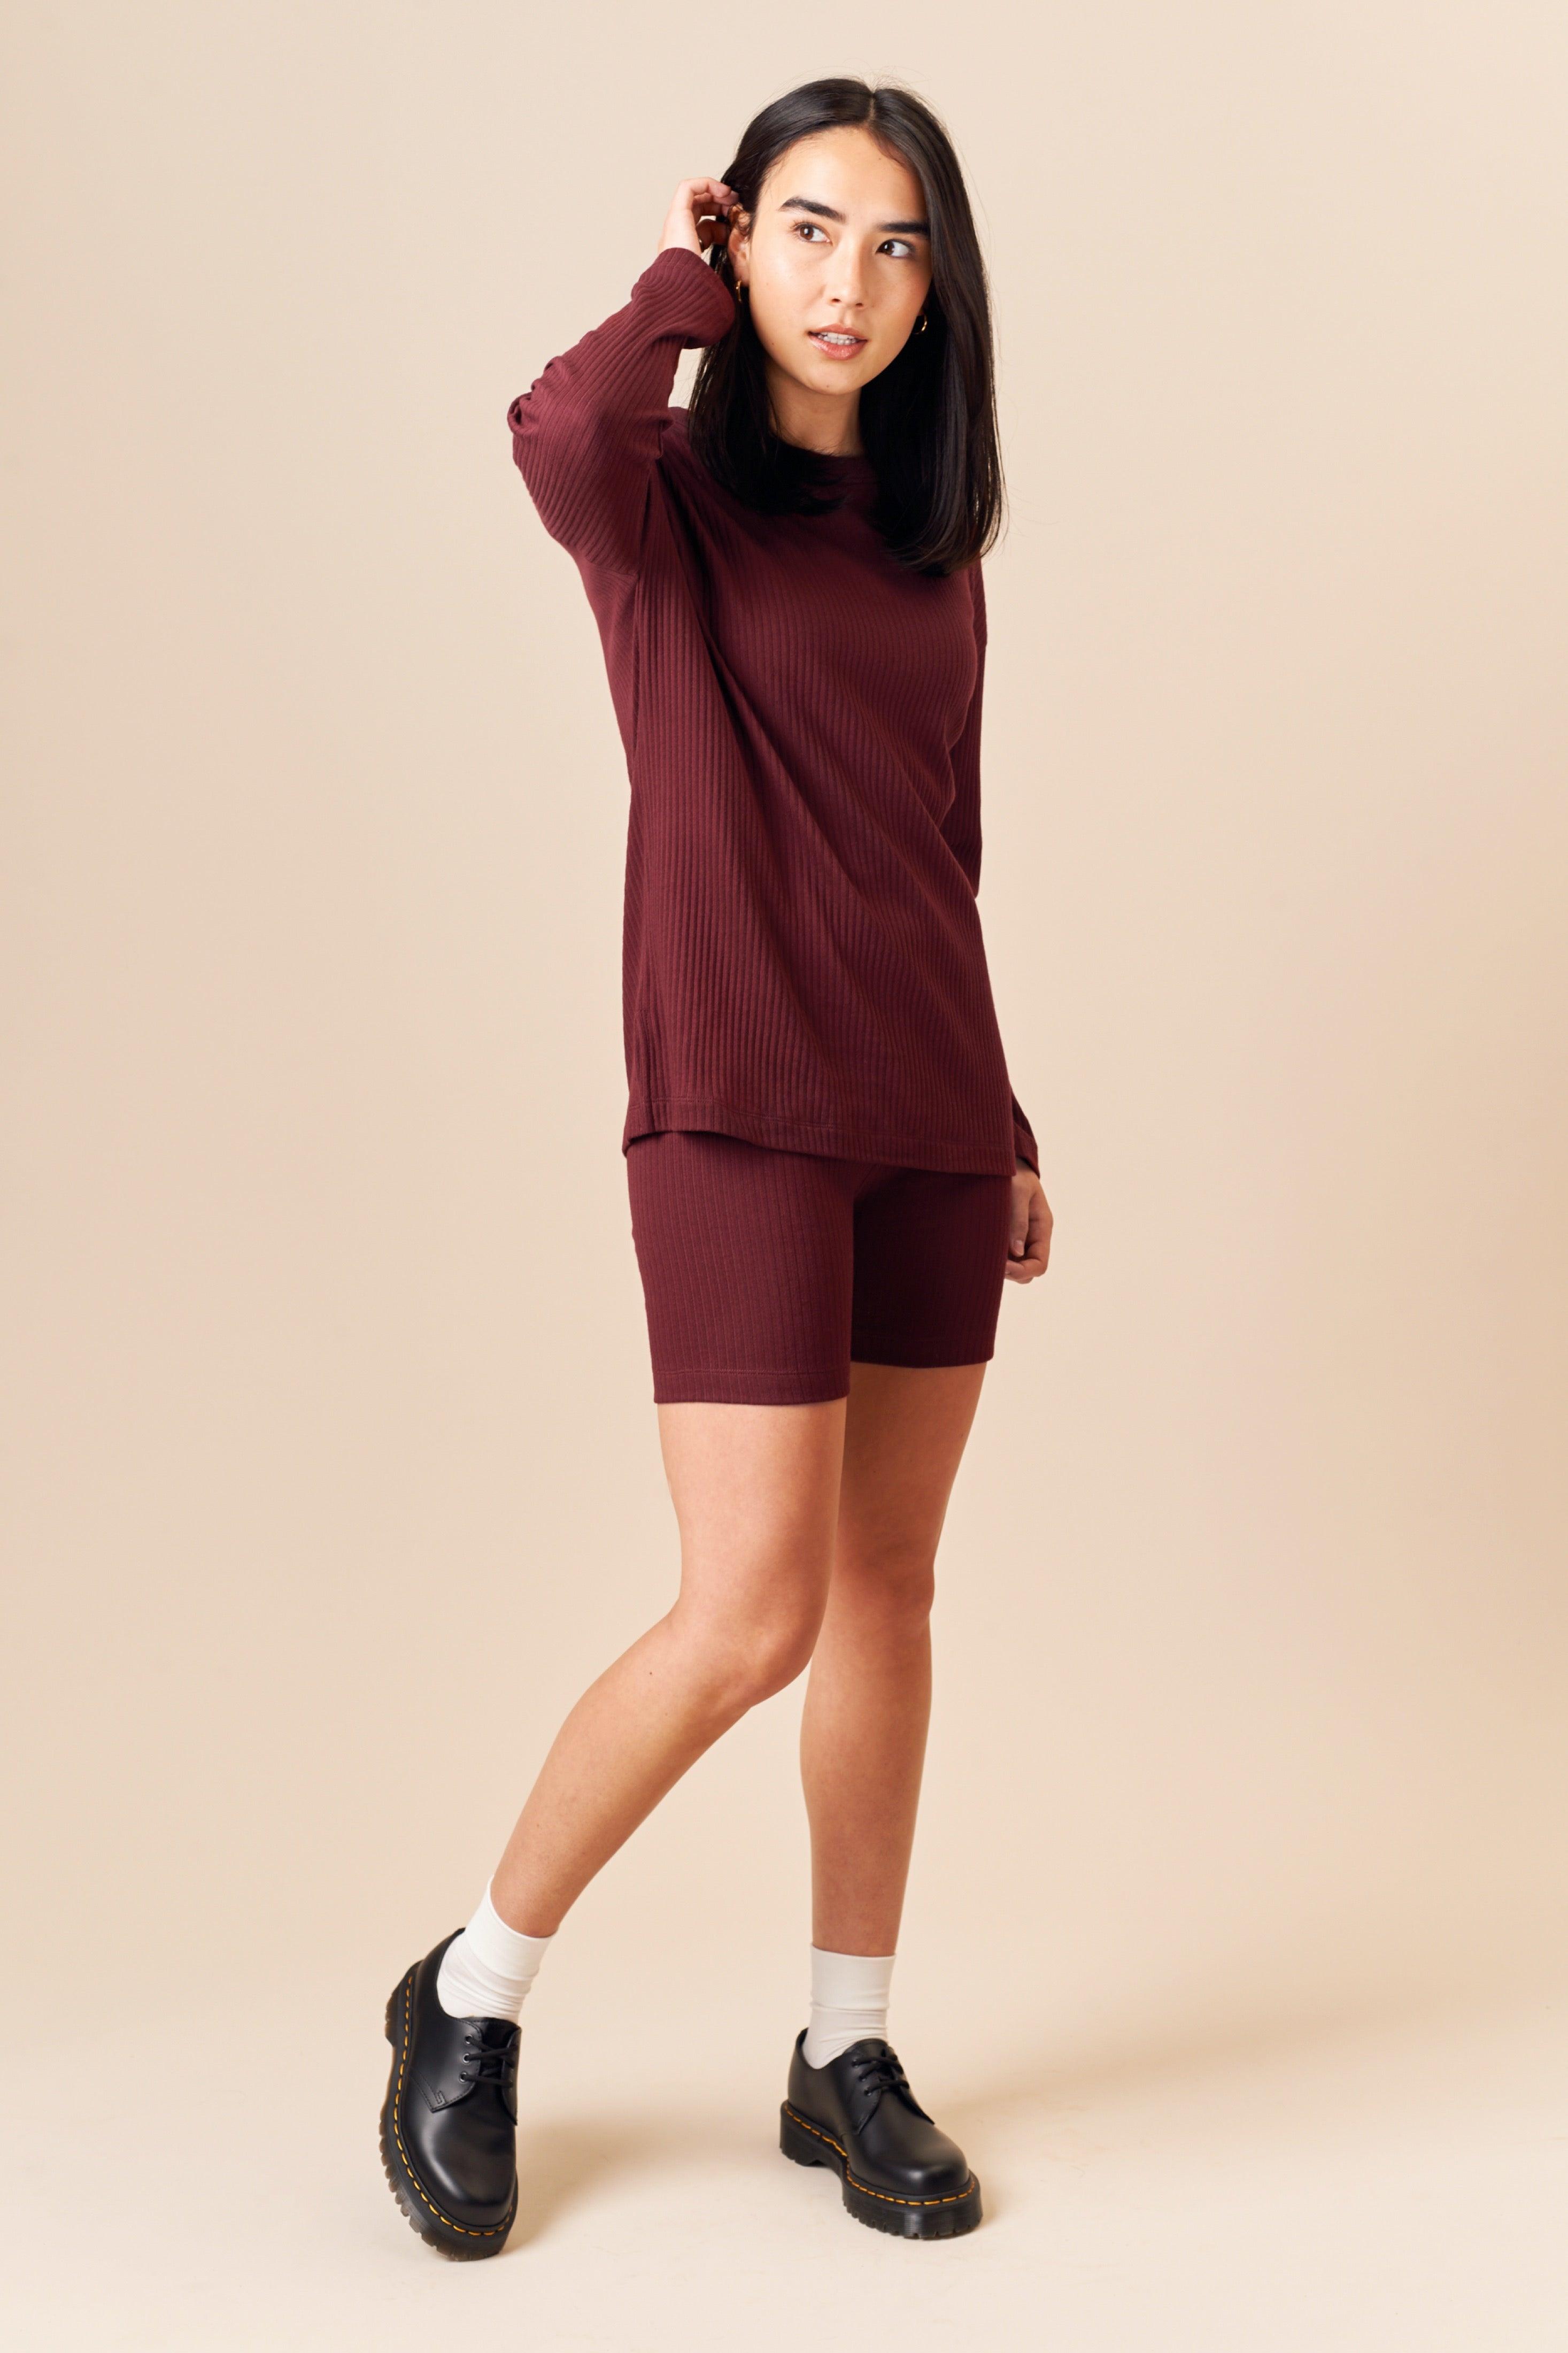 Kotn Women's Ribbed Shorts in Zinfandel, Size XL